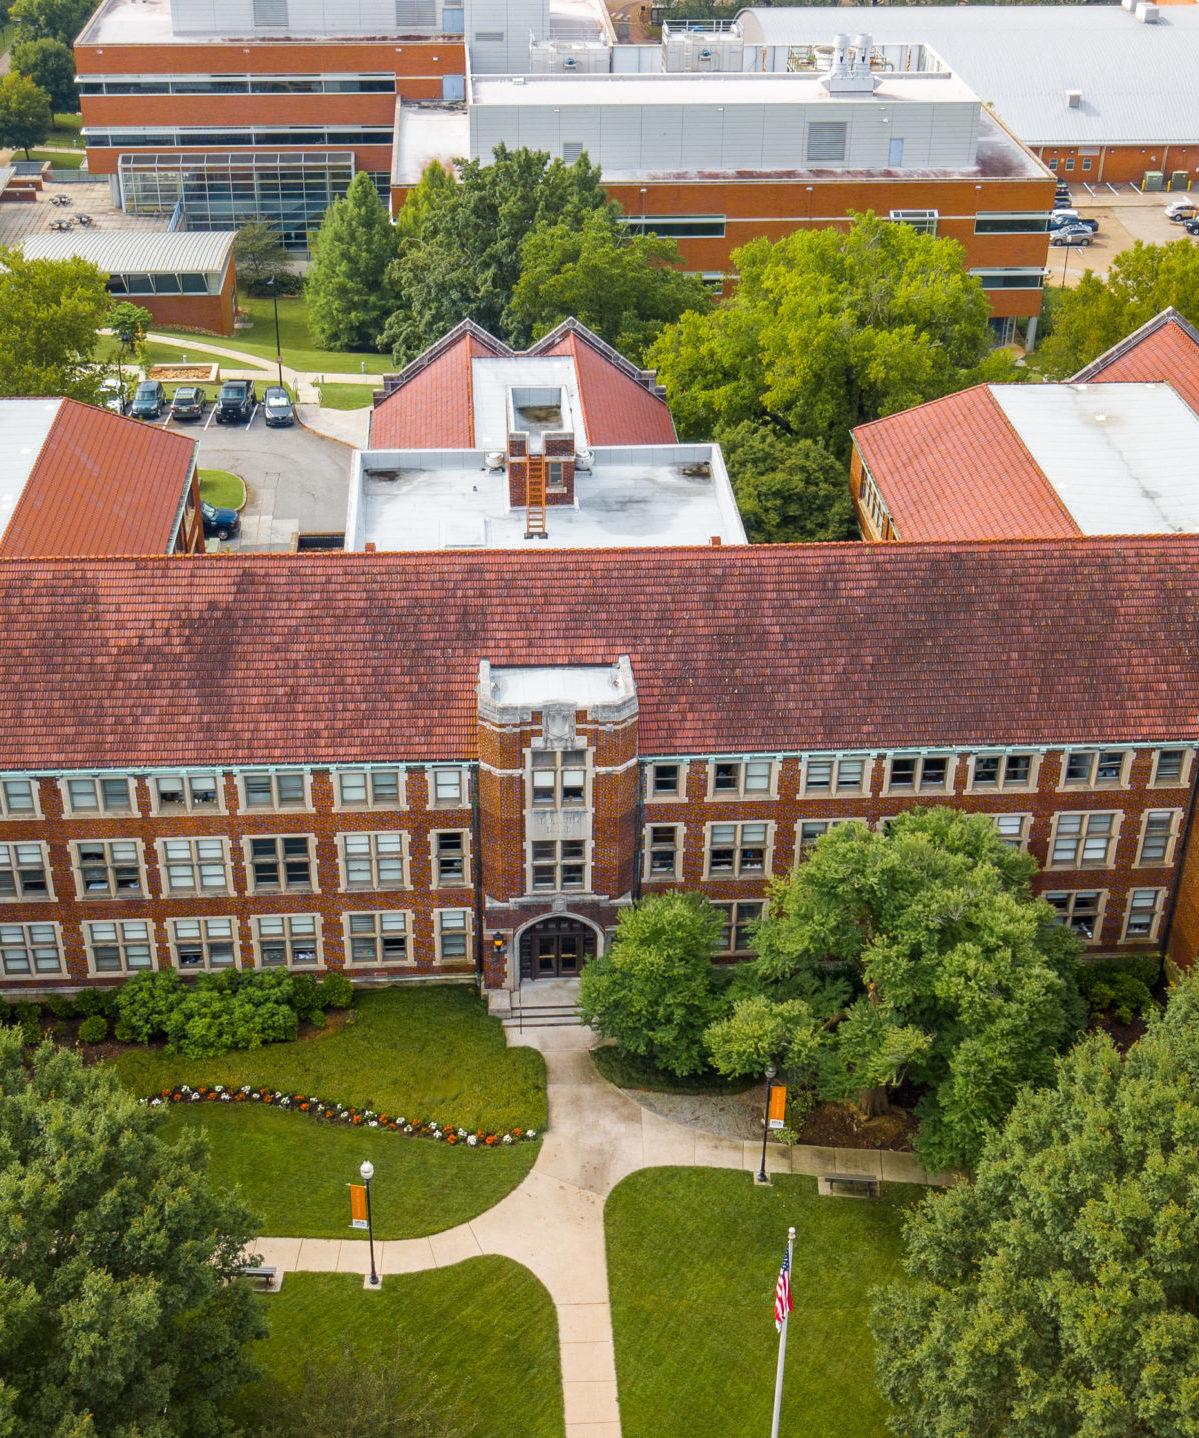 Aerial View of Morgan Hall